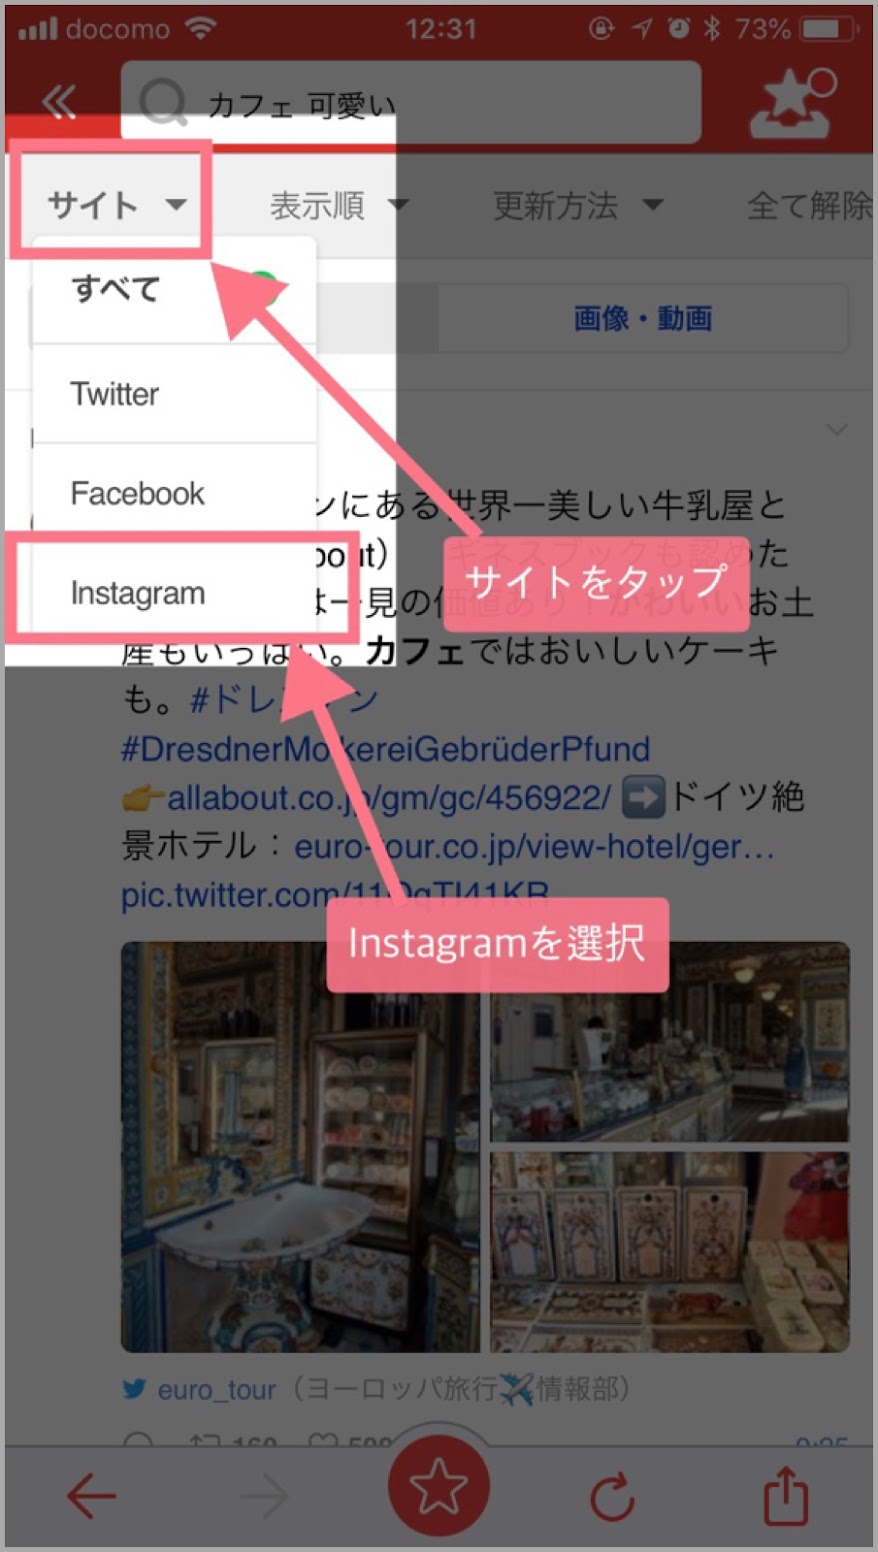 Yahoo!リアルタイム検索でInstagram